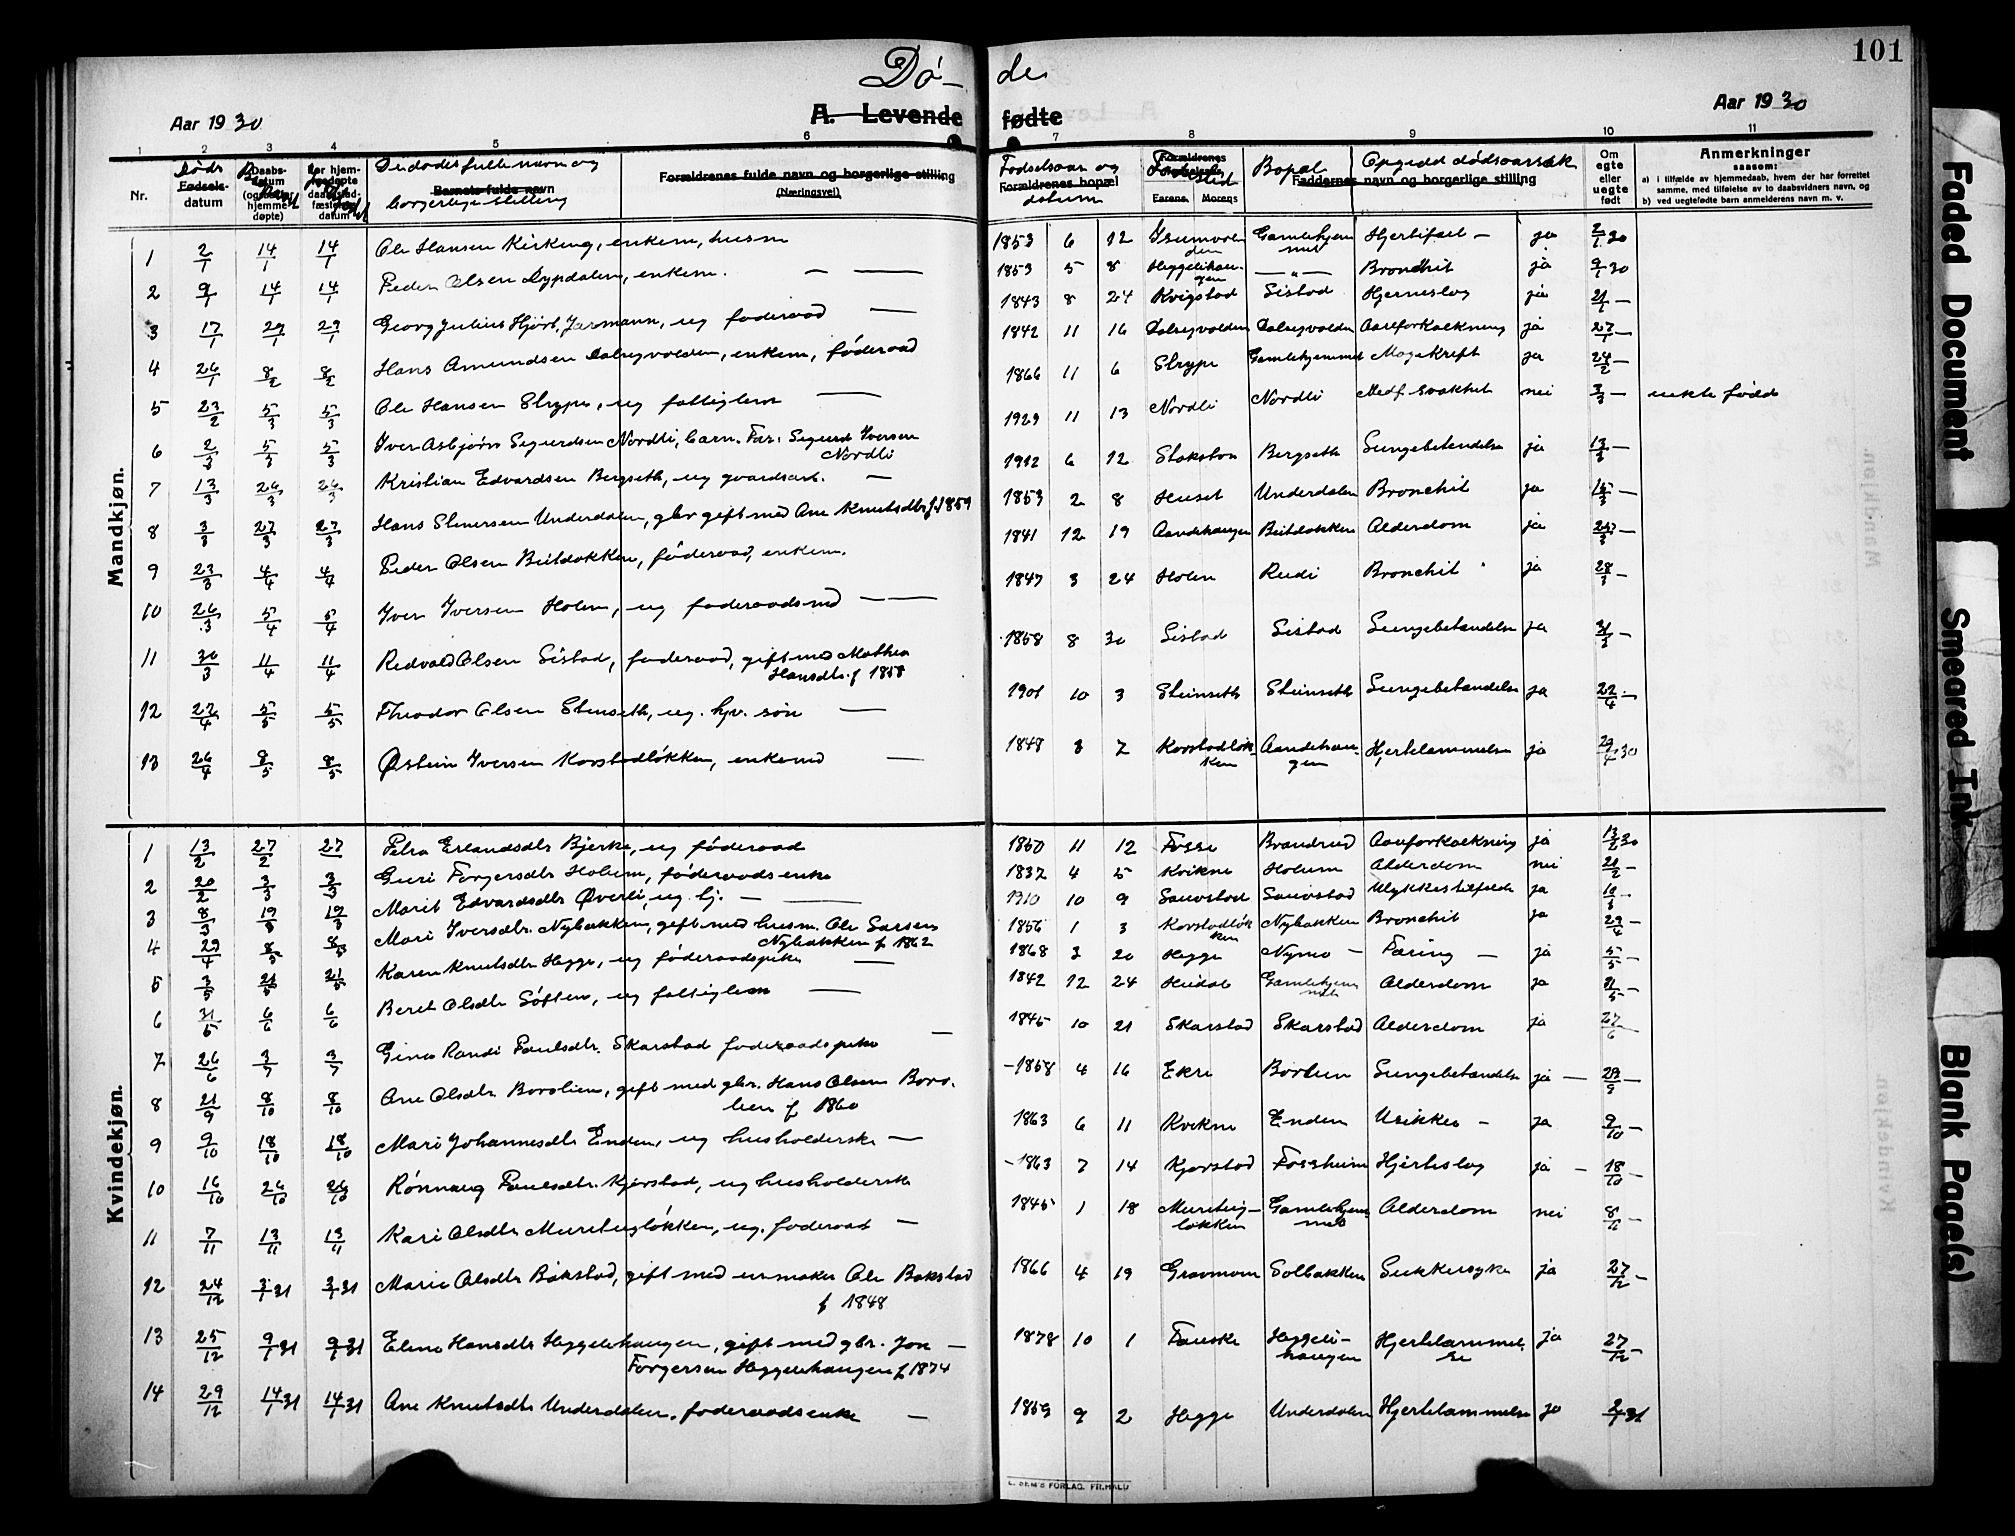 SAH, Sør-Fron prestekontor, H/Ha/Hab/L0005: Klokkerbok nr. 5, 1912-1930, s. 101